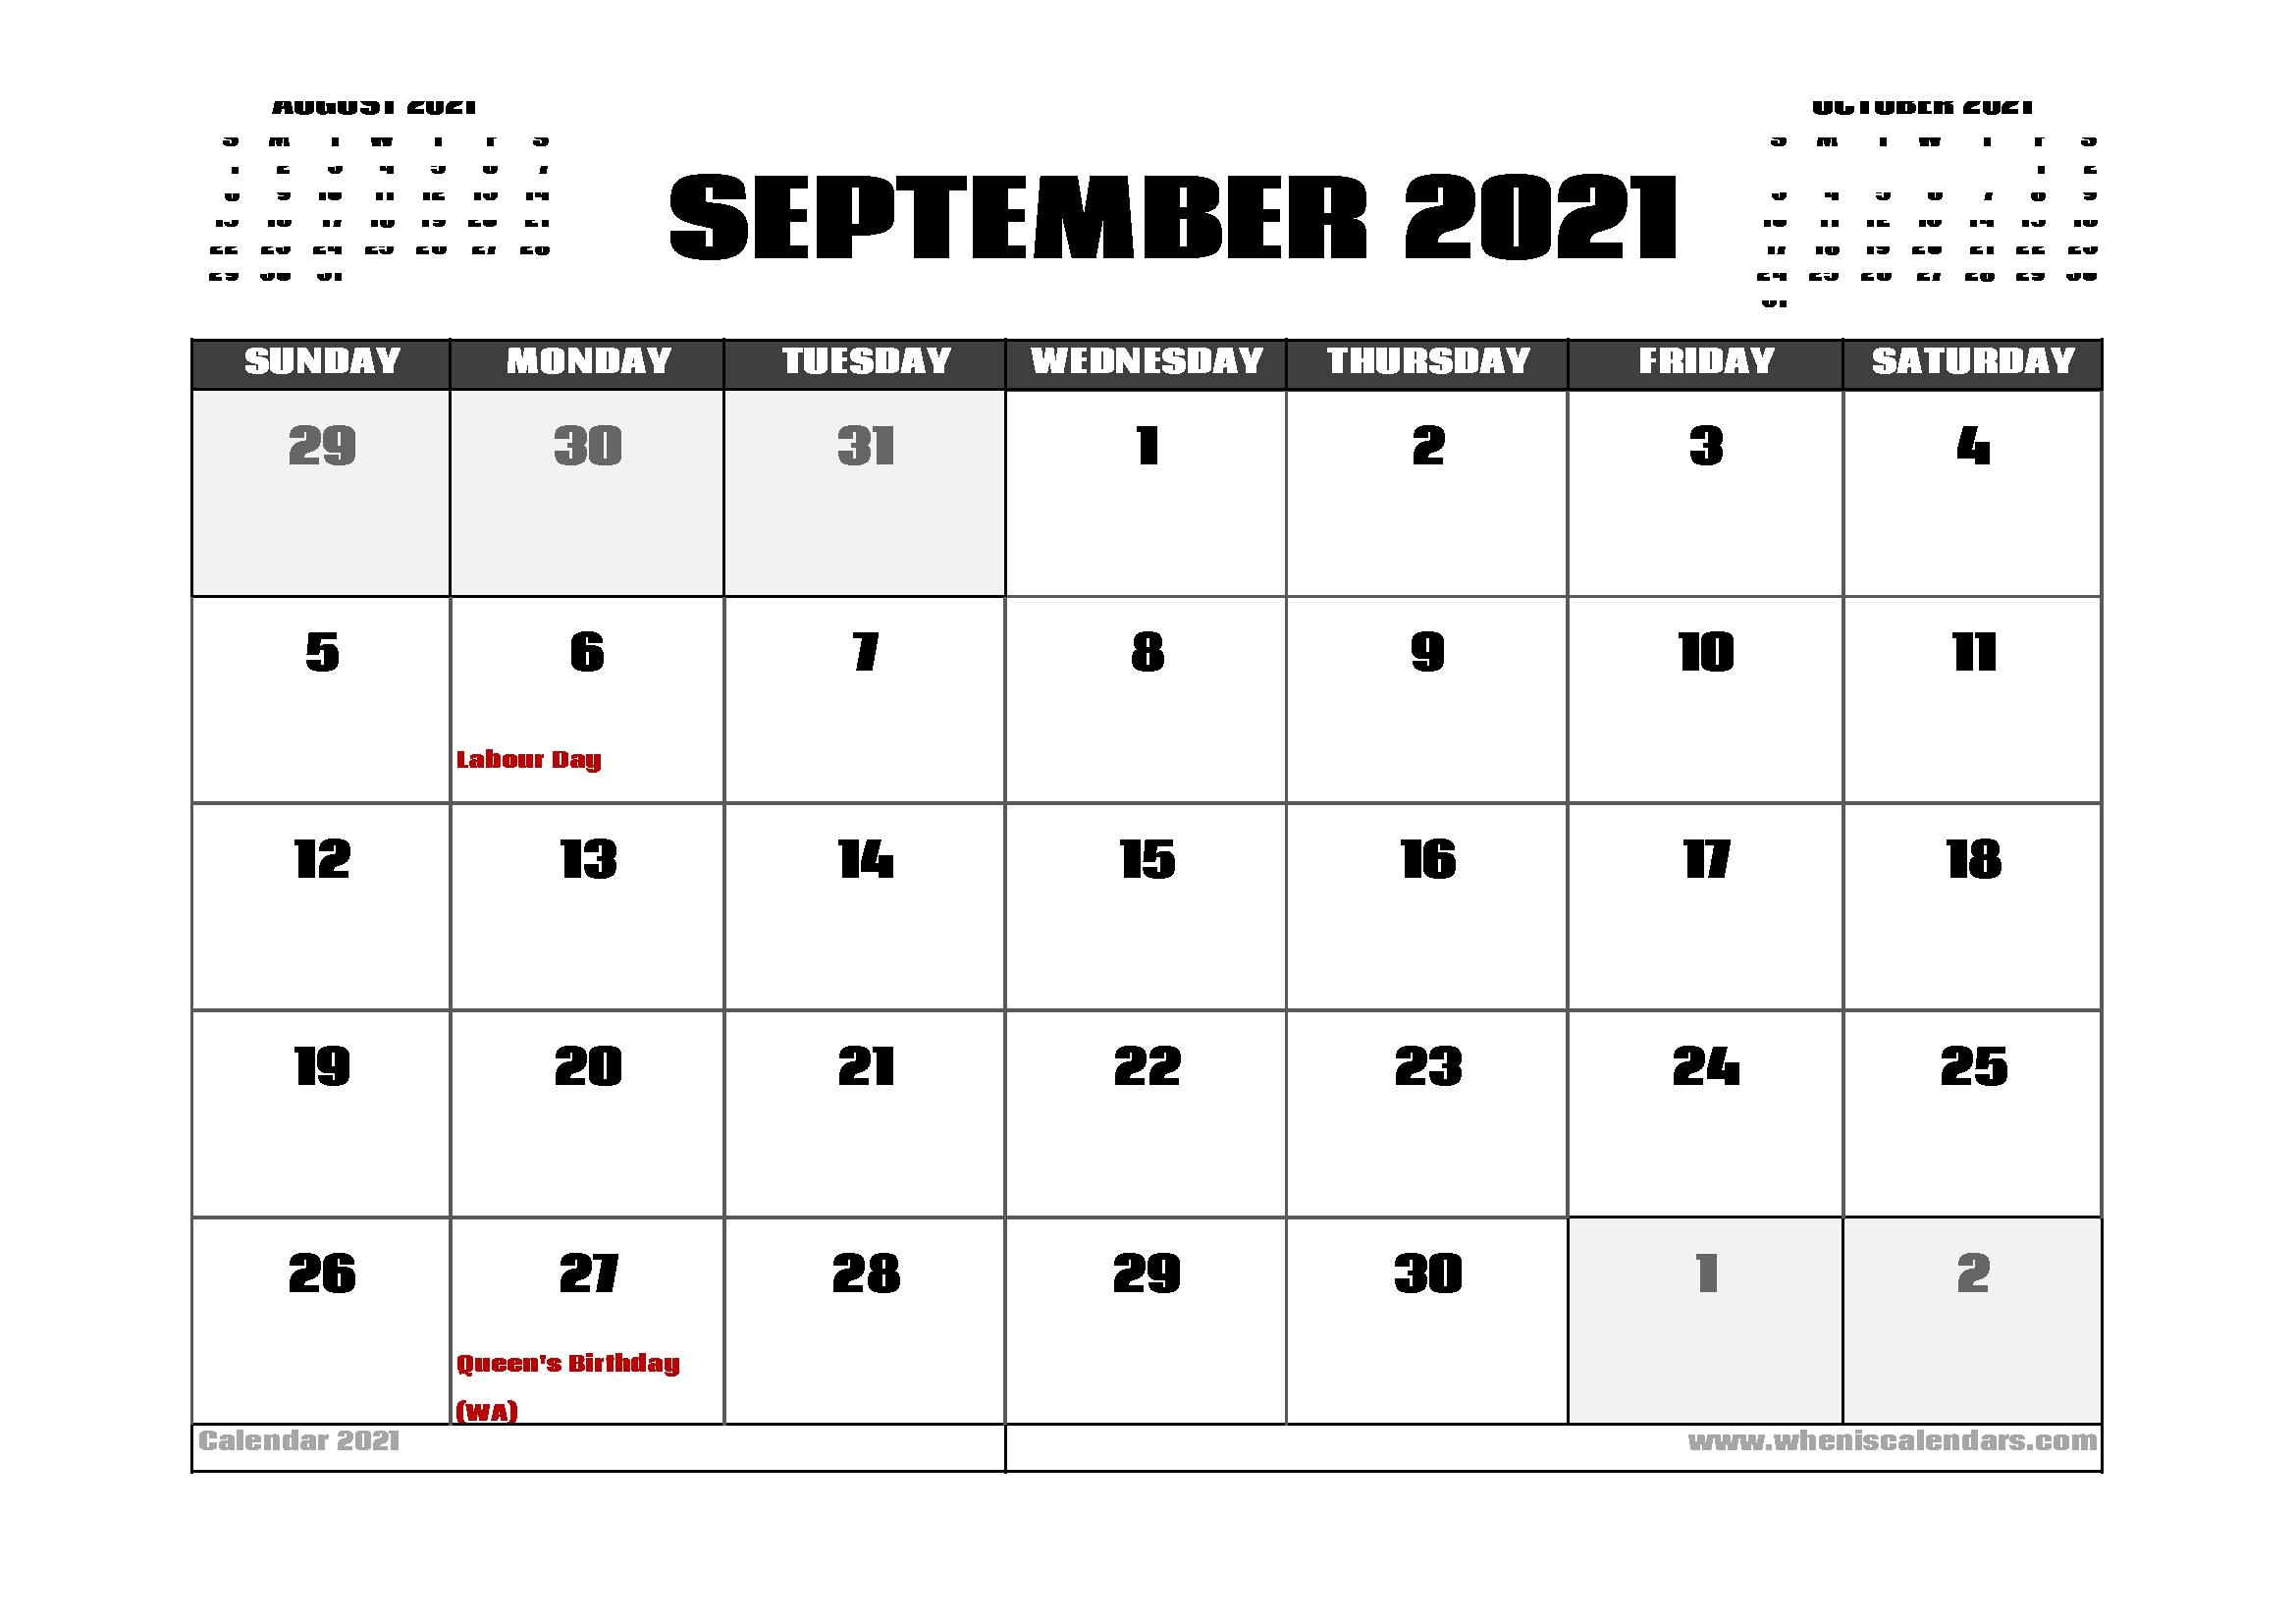 September 2021 Calendar With Holidays - September 2021